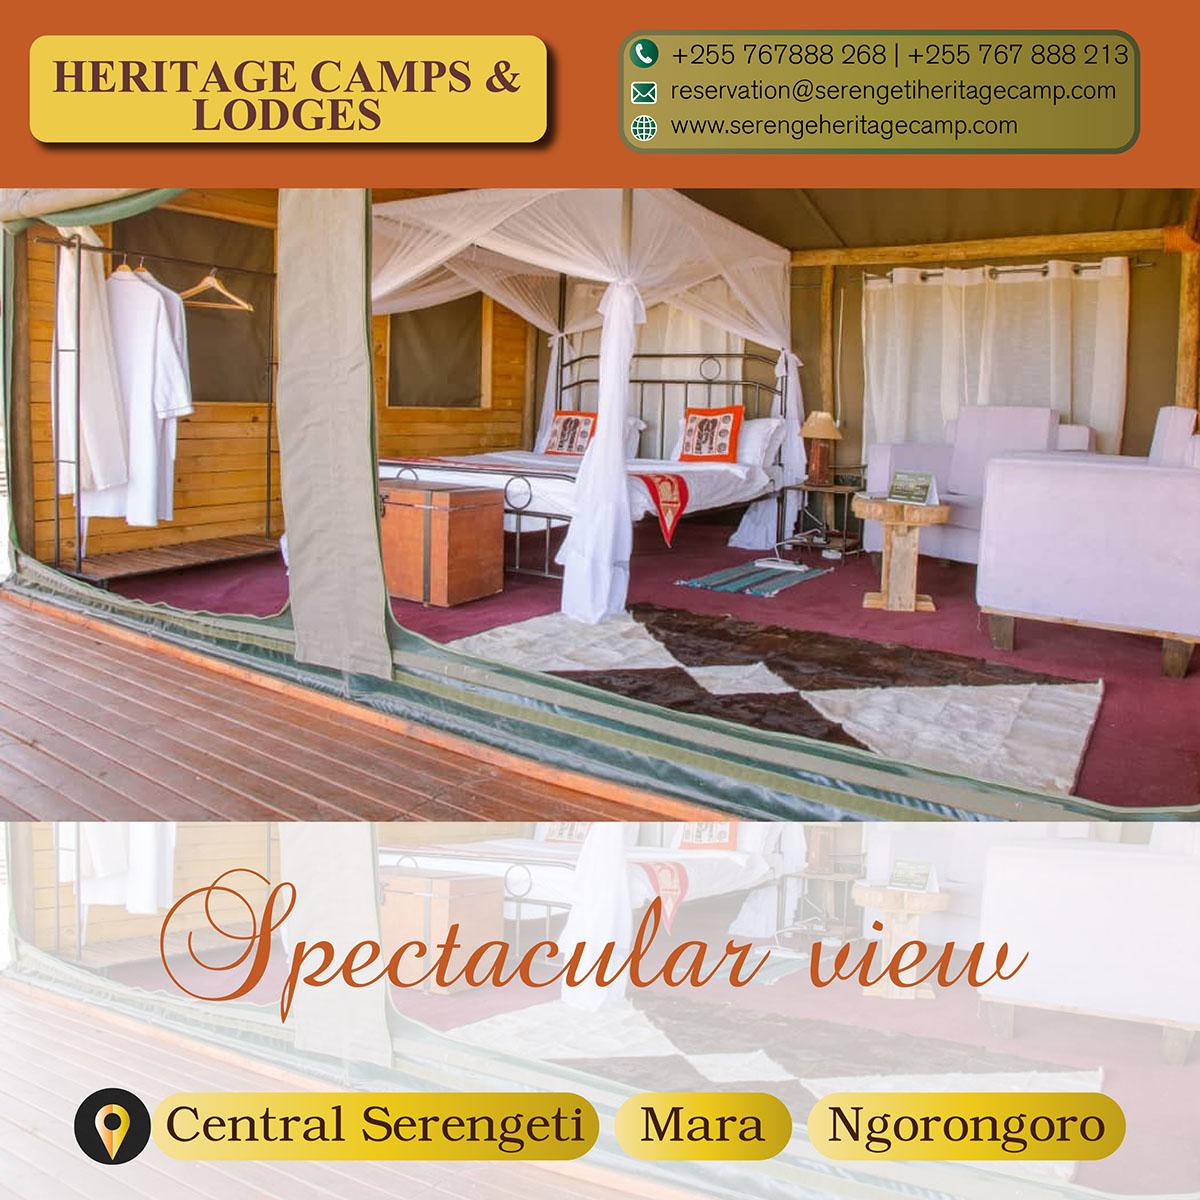 Serengeti Heritage Camps & Lodges